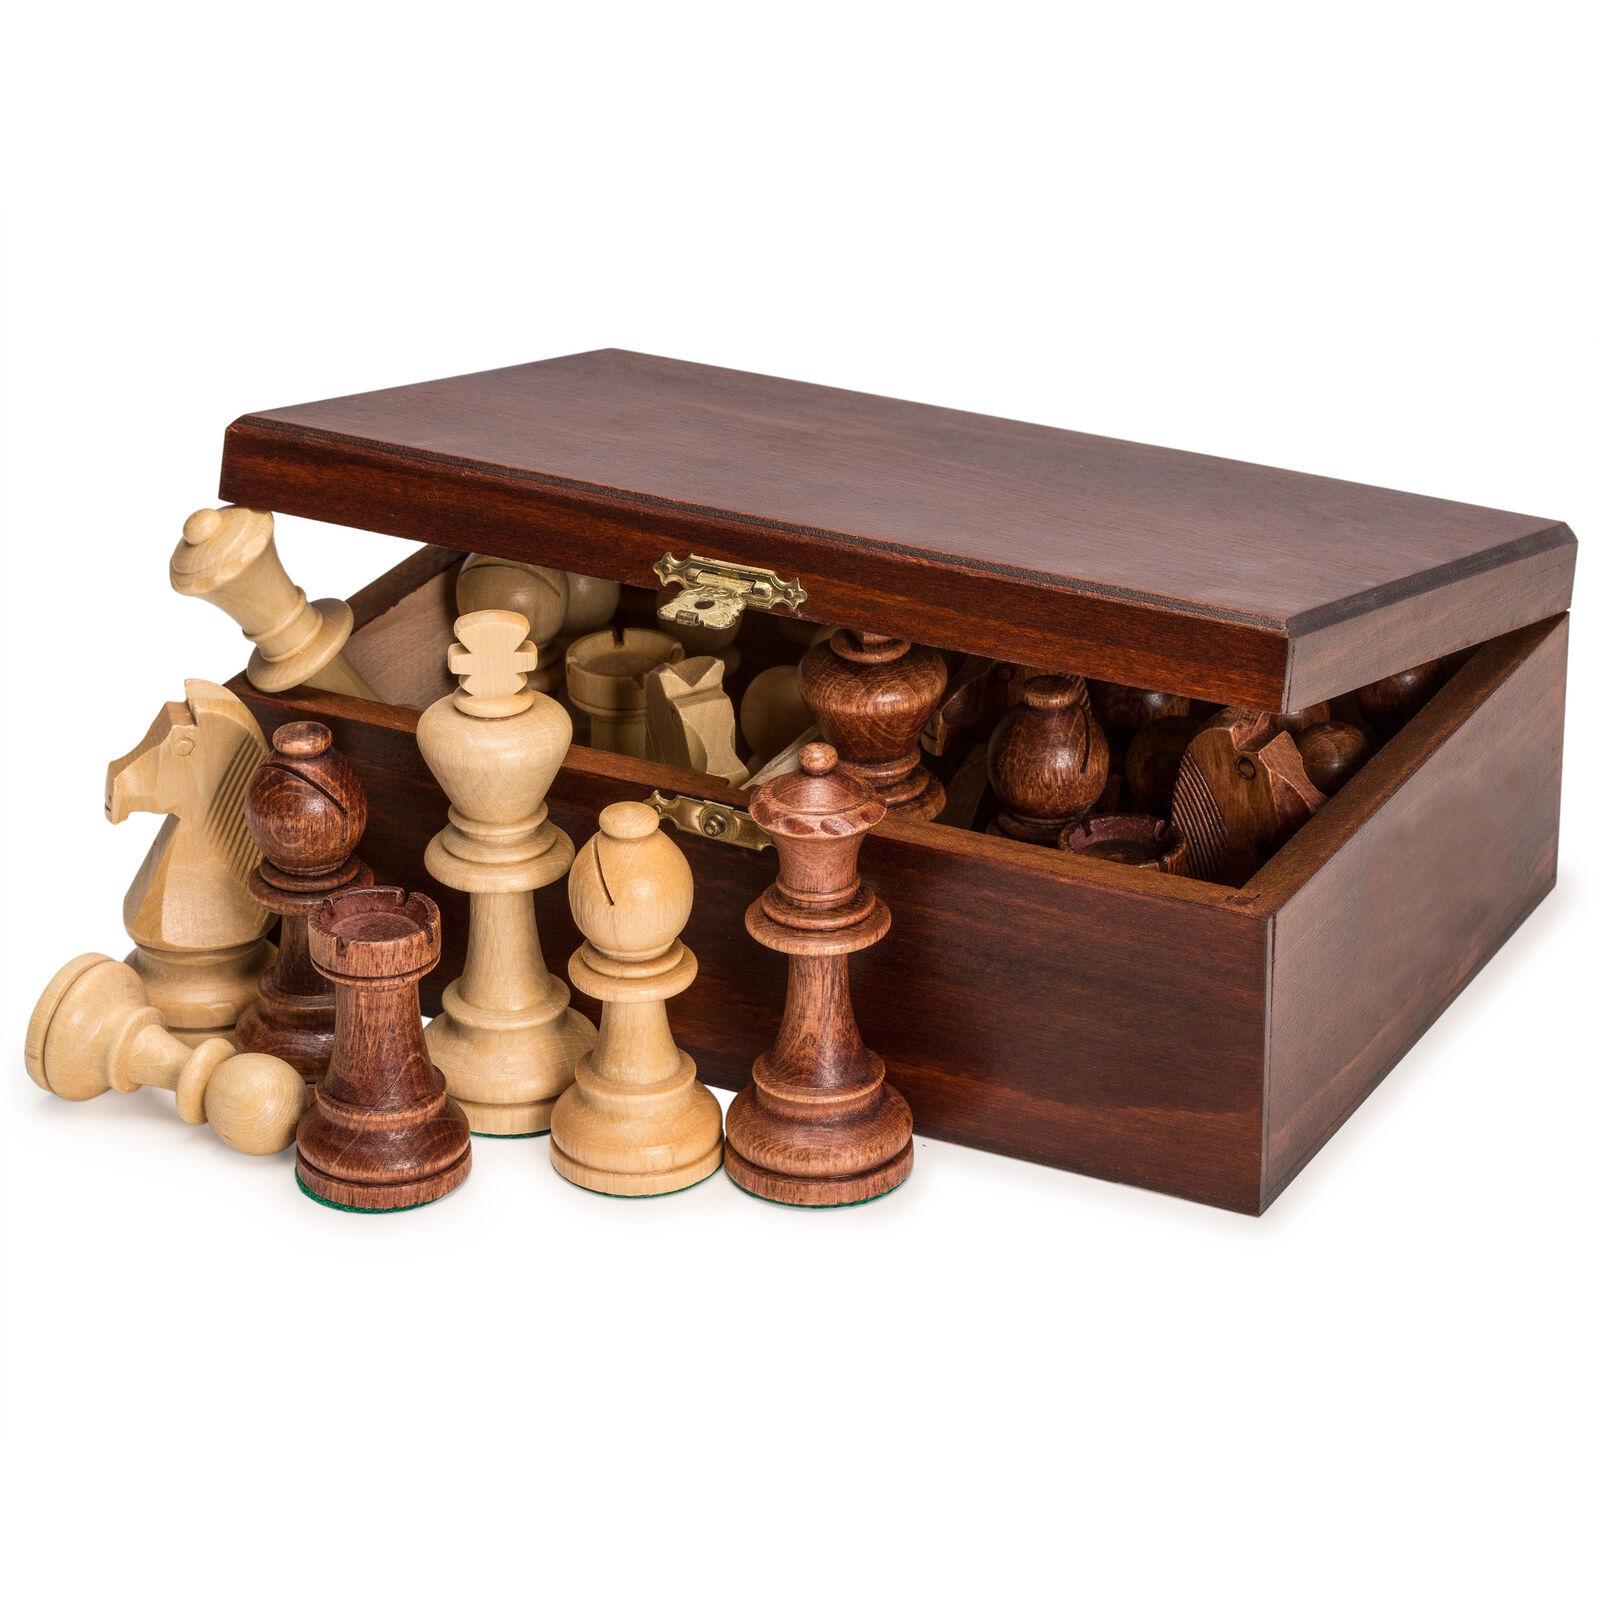 Staunton No. 7 Tournament Chess Pieces in Wooden Box - 3.85  King